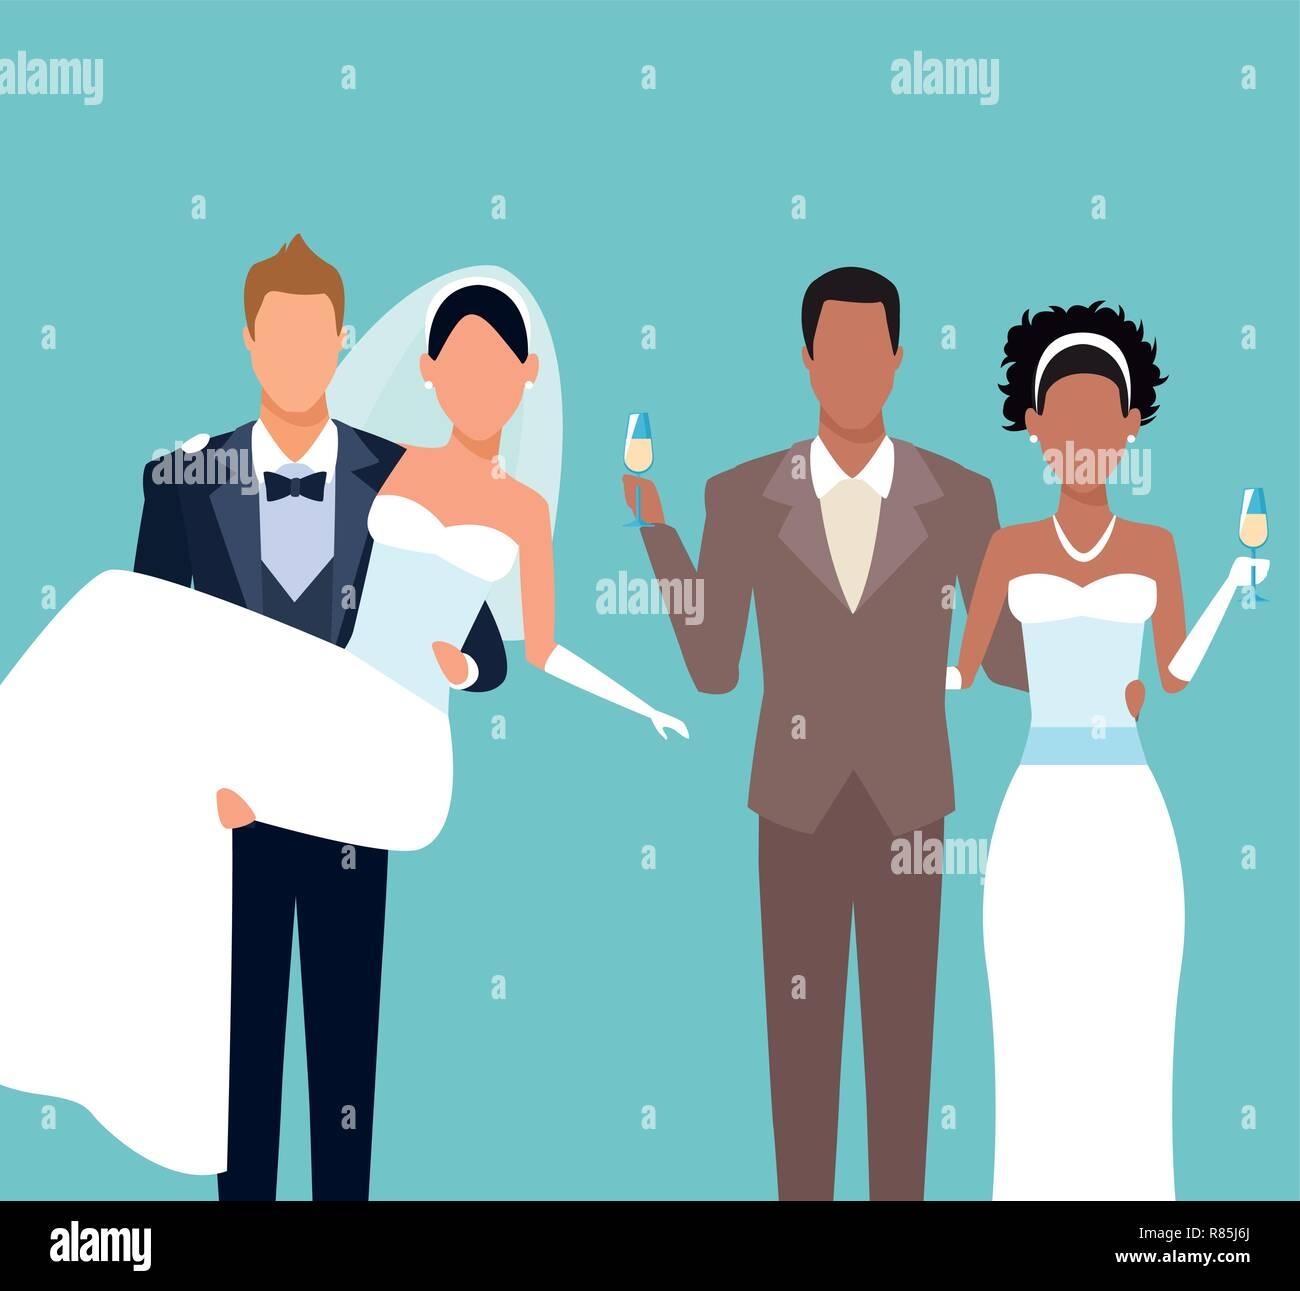 Wedding Couples Cartoon Stock Vector Art Illustration Vector